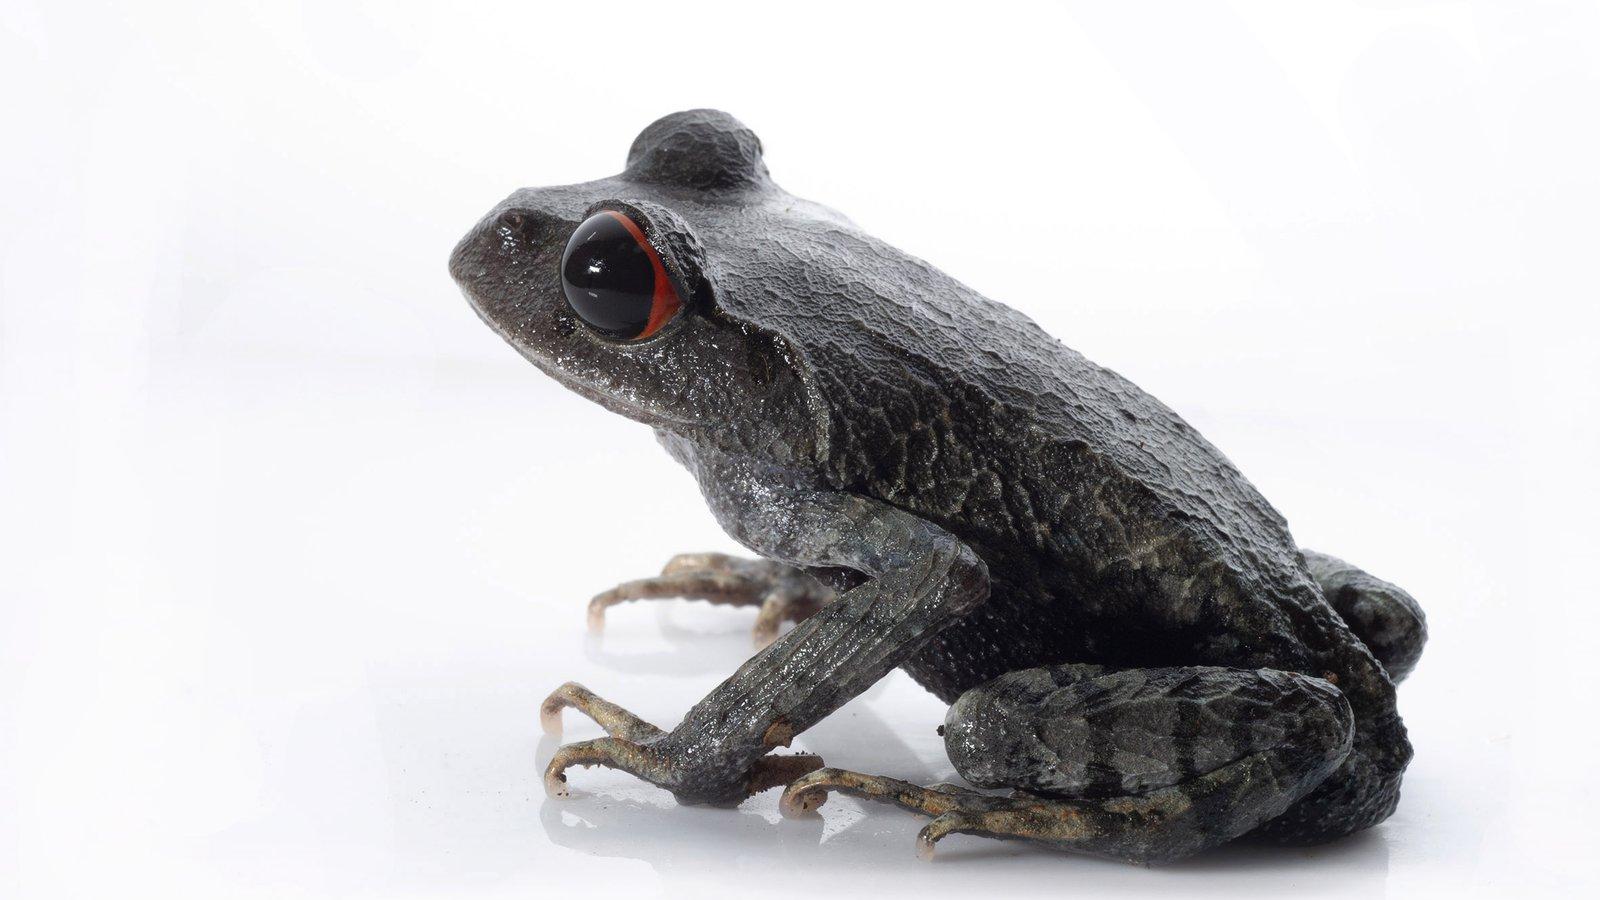 Crescent Moon Spadefoot Frog (Leptobrachium lunatum), Vietnam.